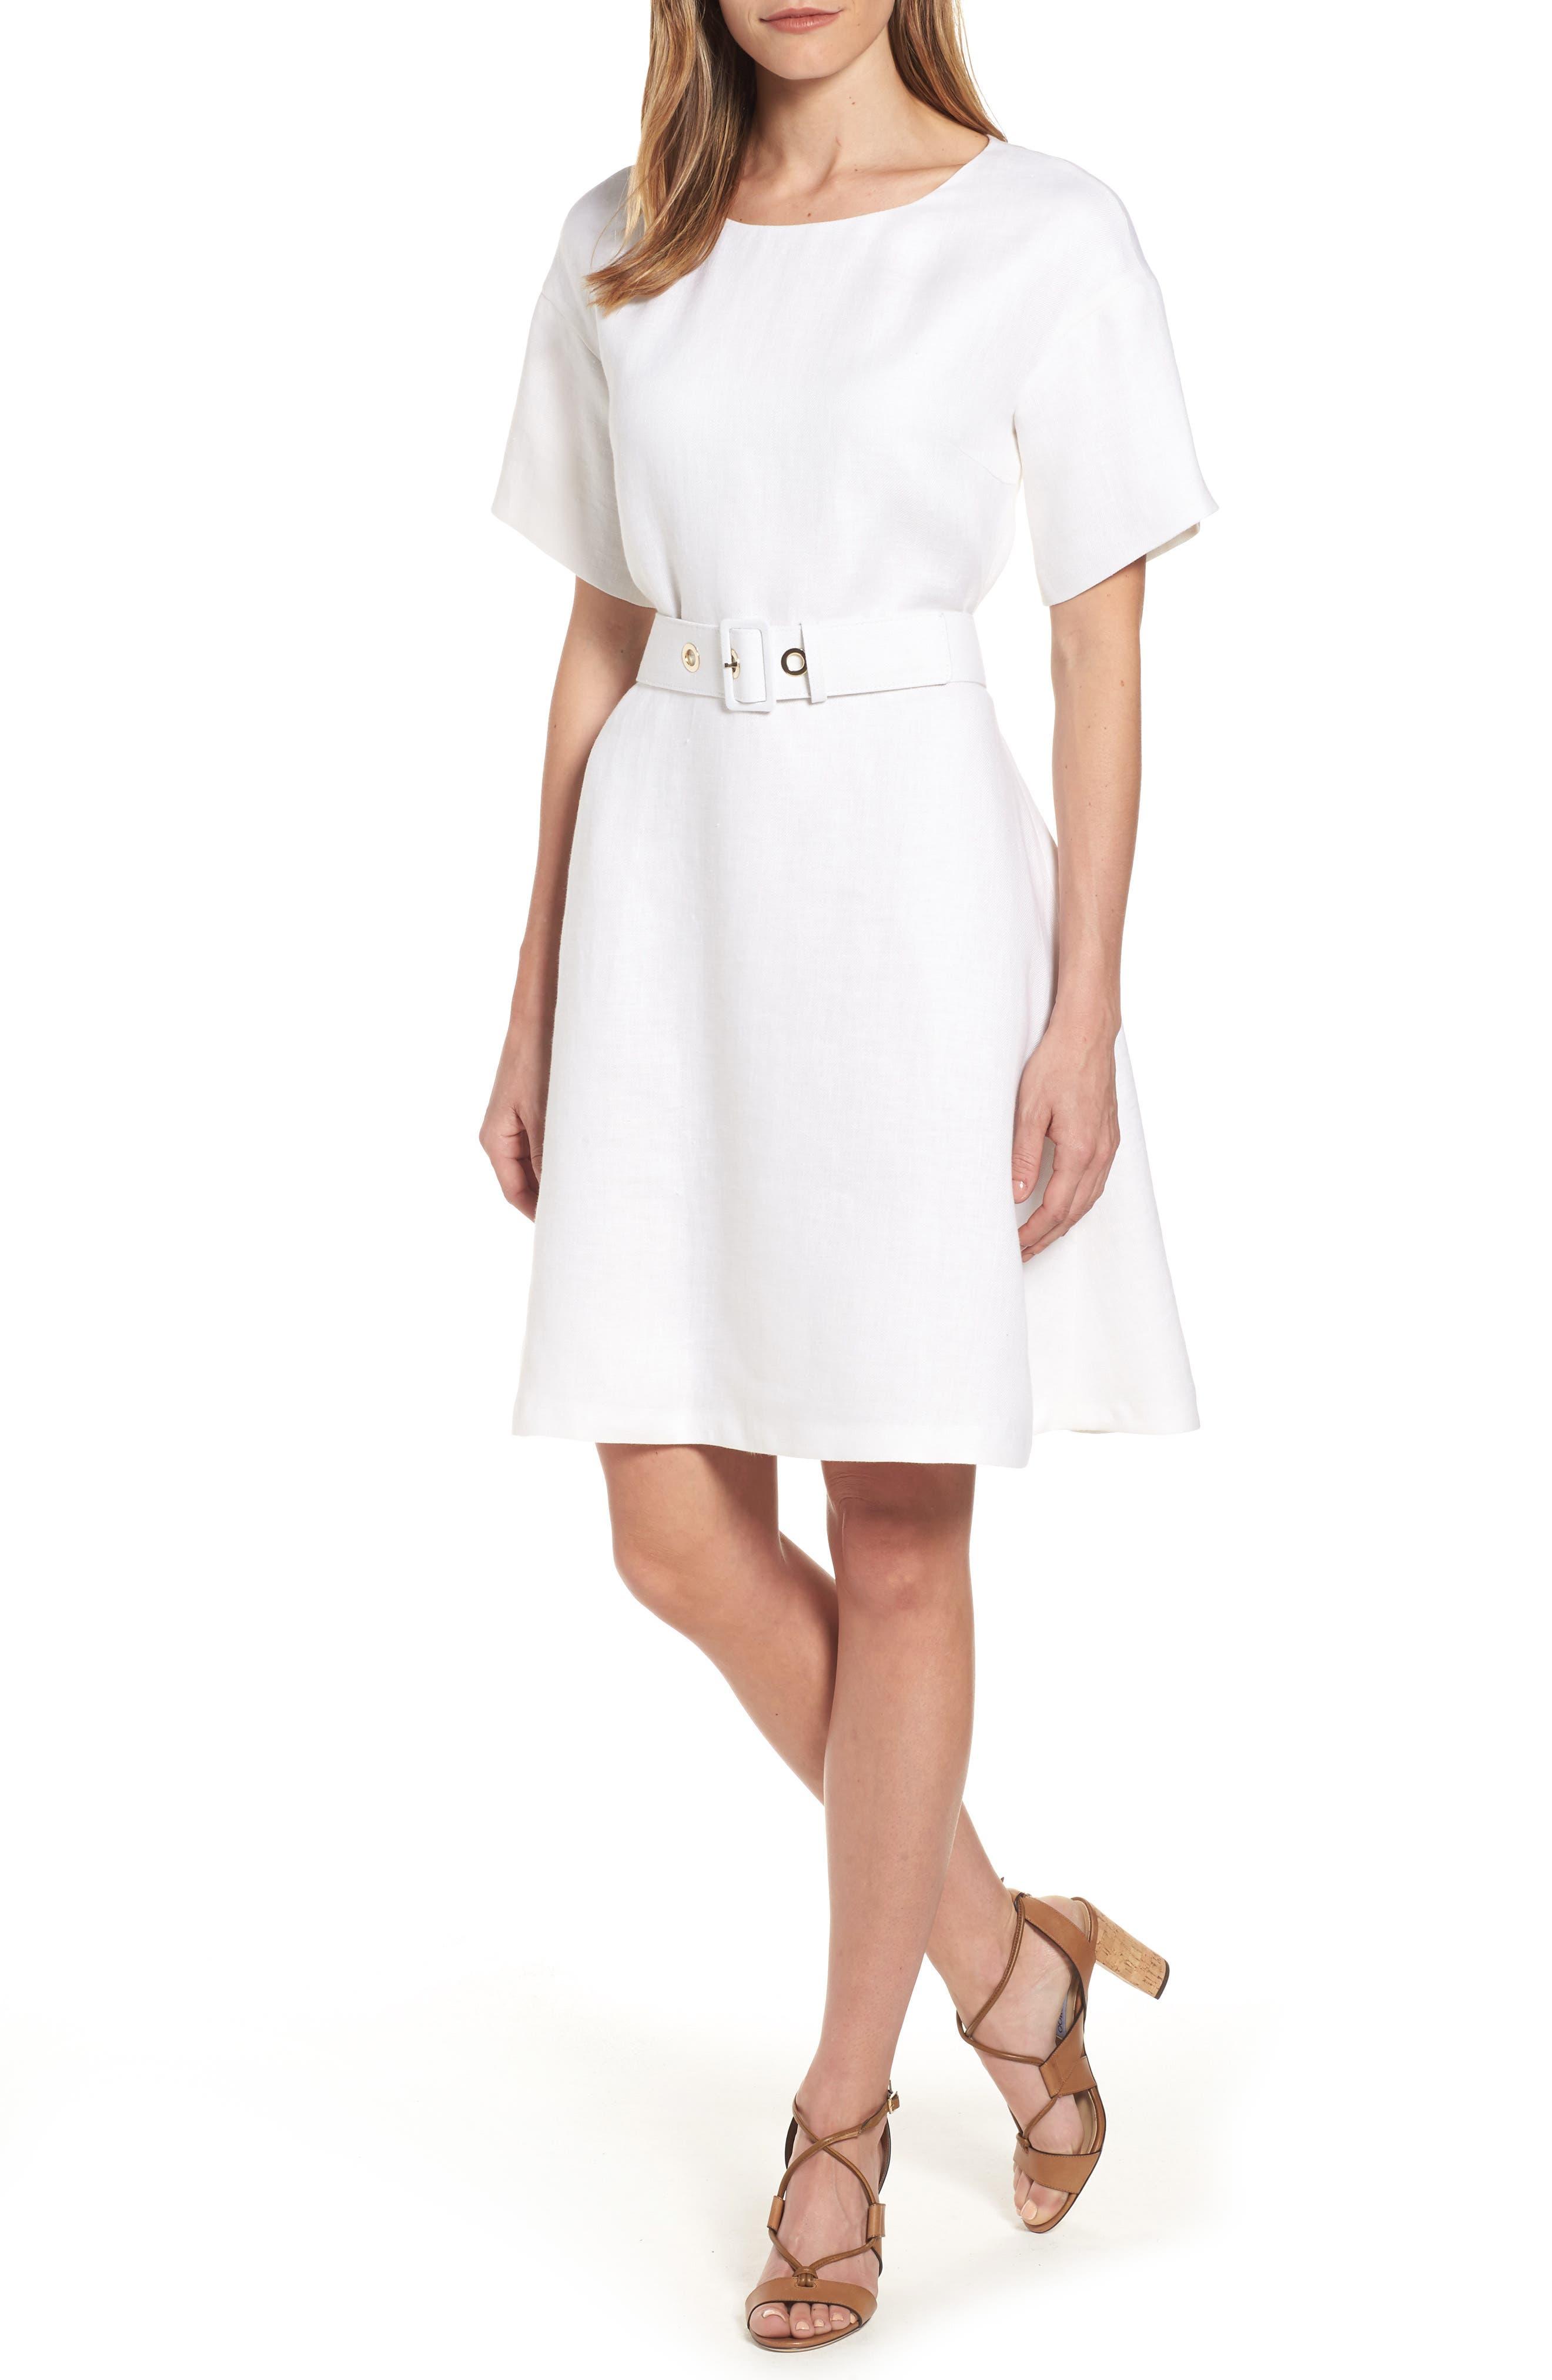 Alternate Image 1 Selected - BOSS Dimisa Linen Belted A-Line Dress (Regular & Petite)